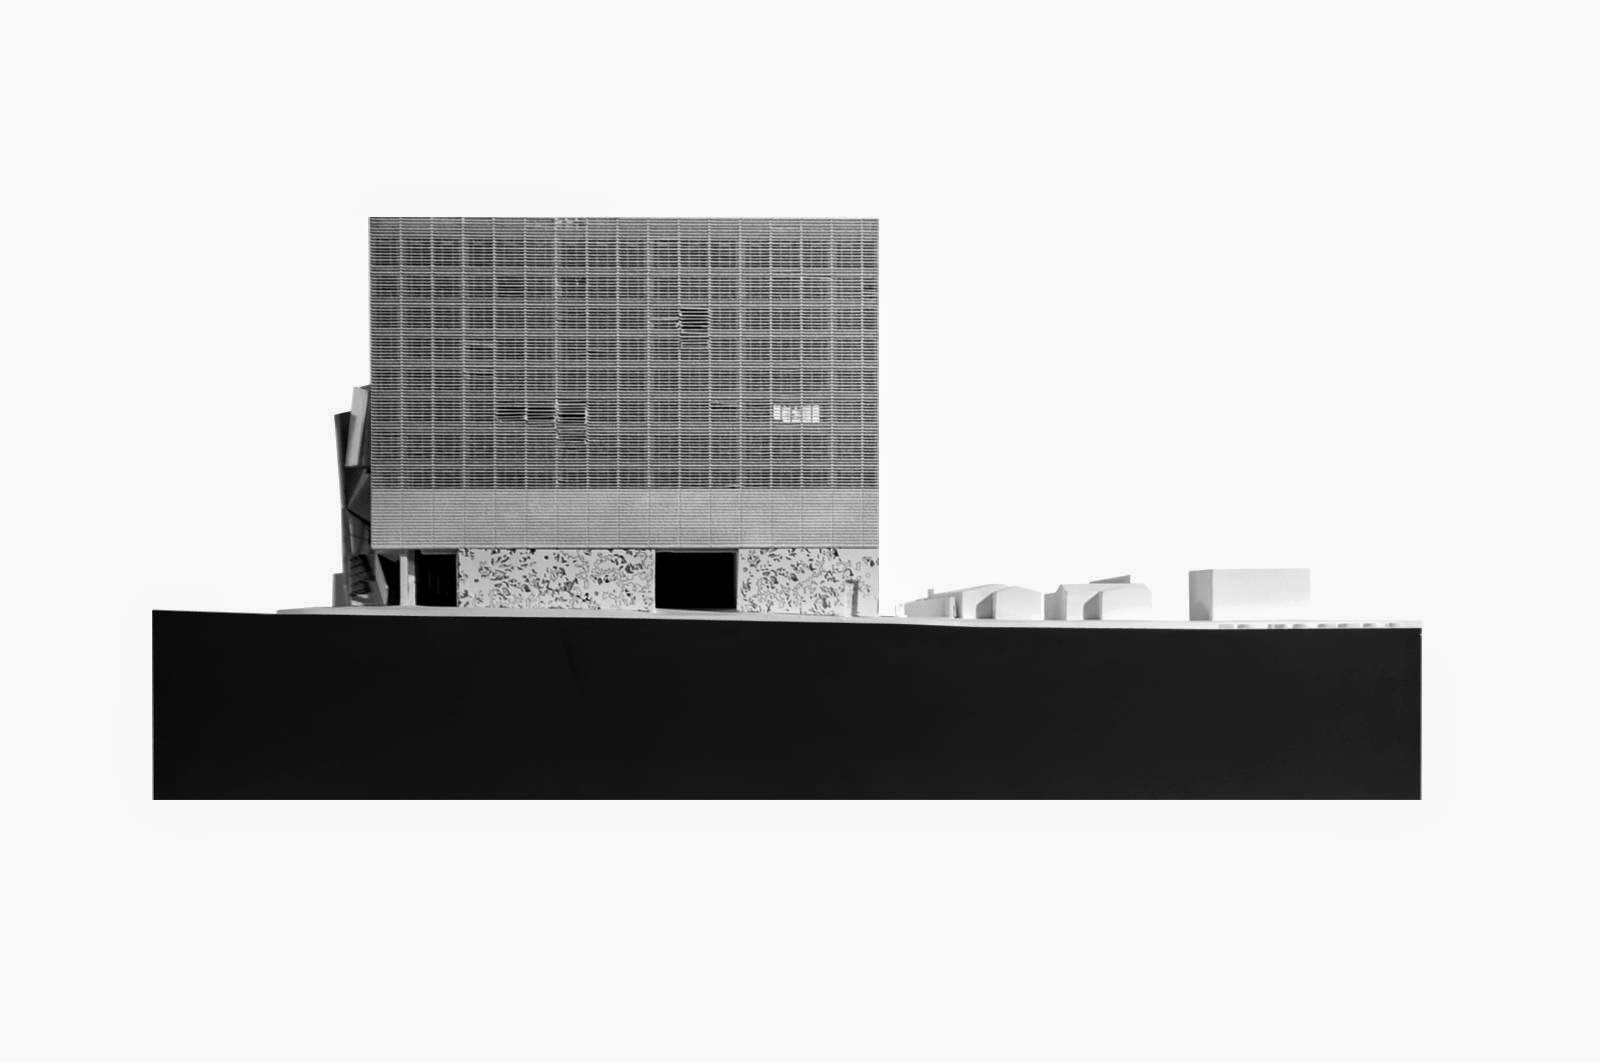 Aia La 2014 Restaurant Design Awards : Aia la design awards aib architecture